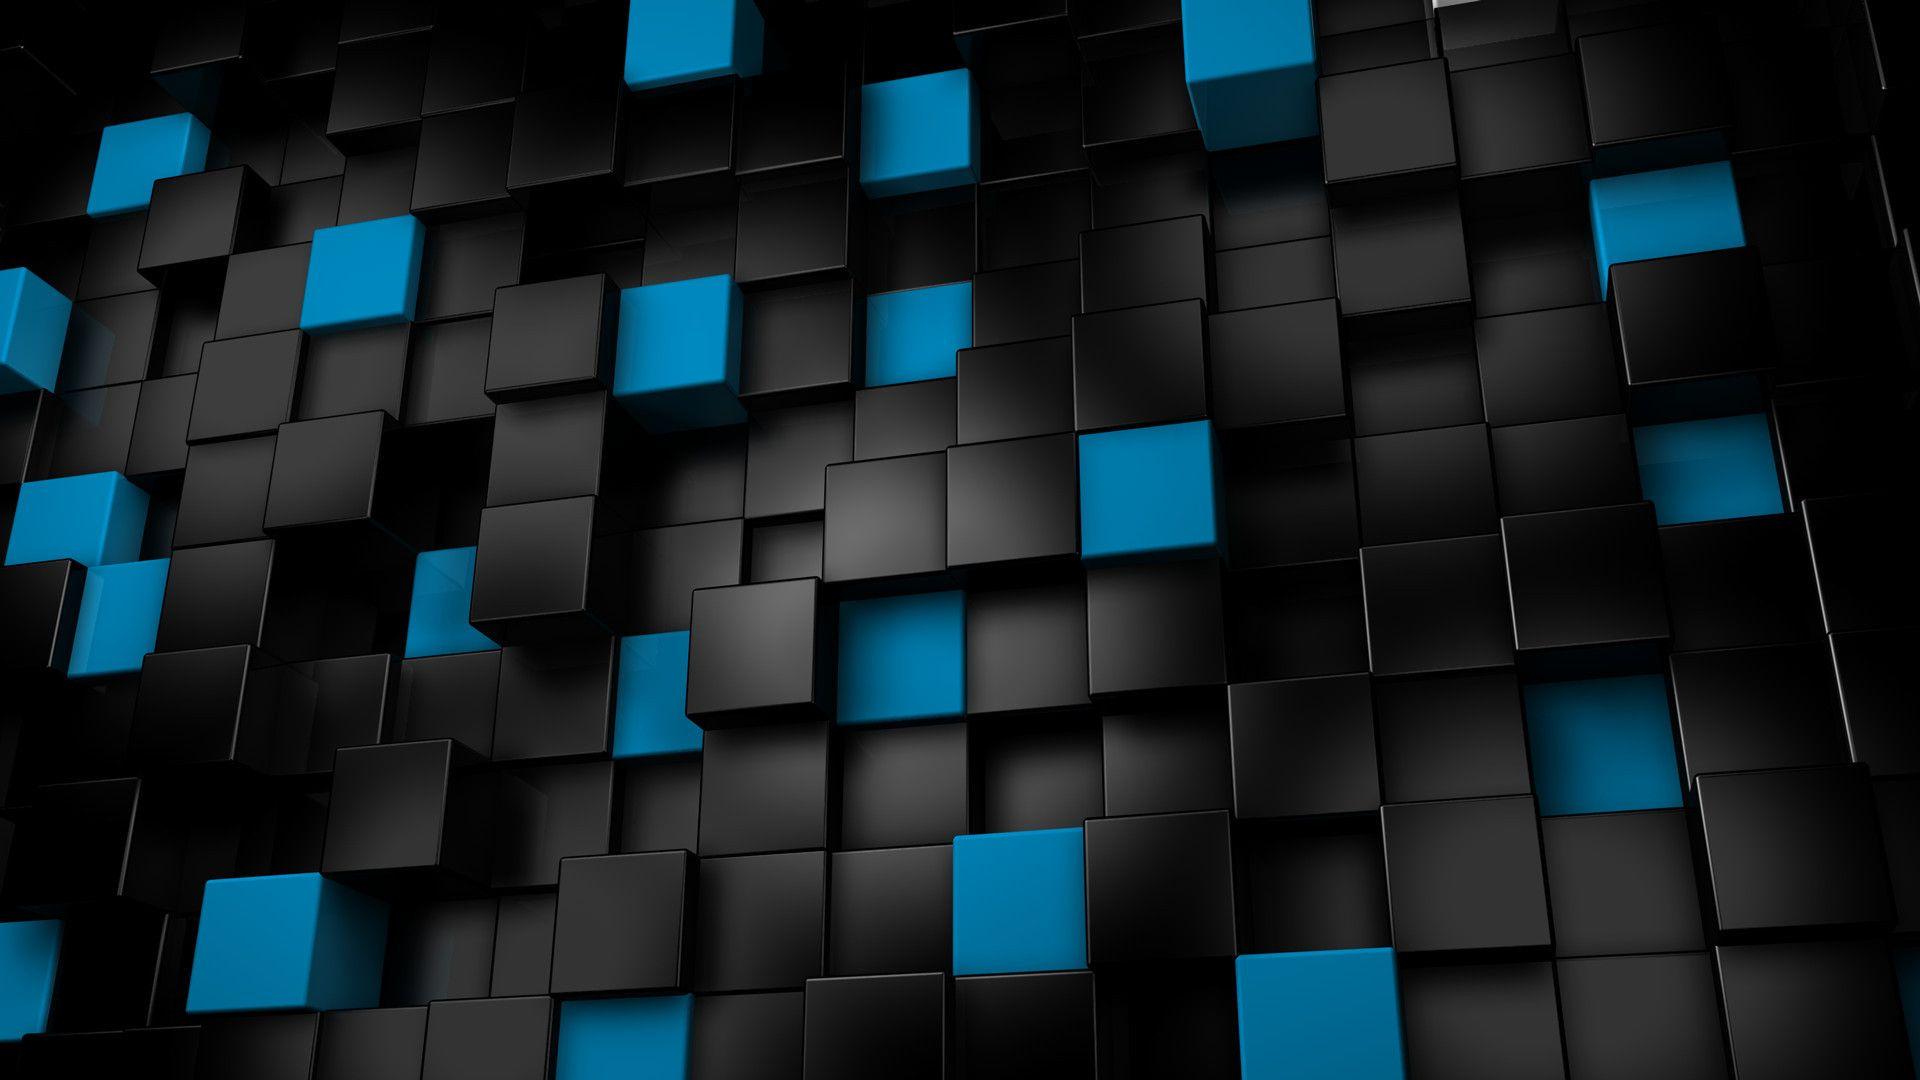 3d Abstract Wallpaper 2021 Live Wallpaper Hd Cool Blue Wallpaper Black And Blue Wallpaper Blue Wallpapers